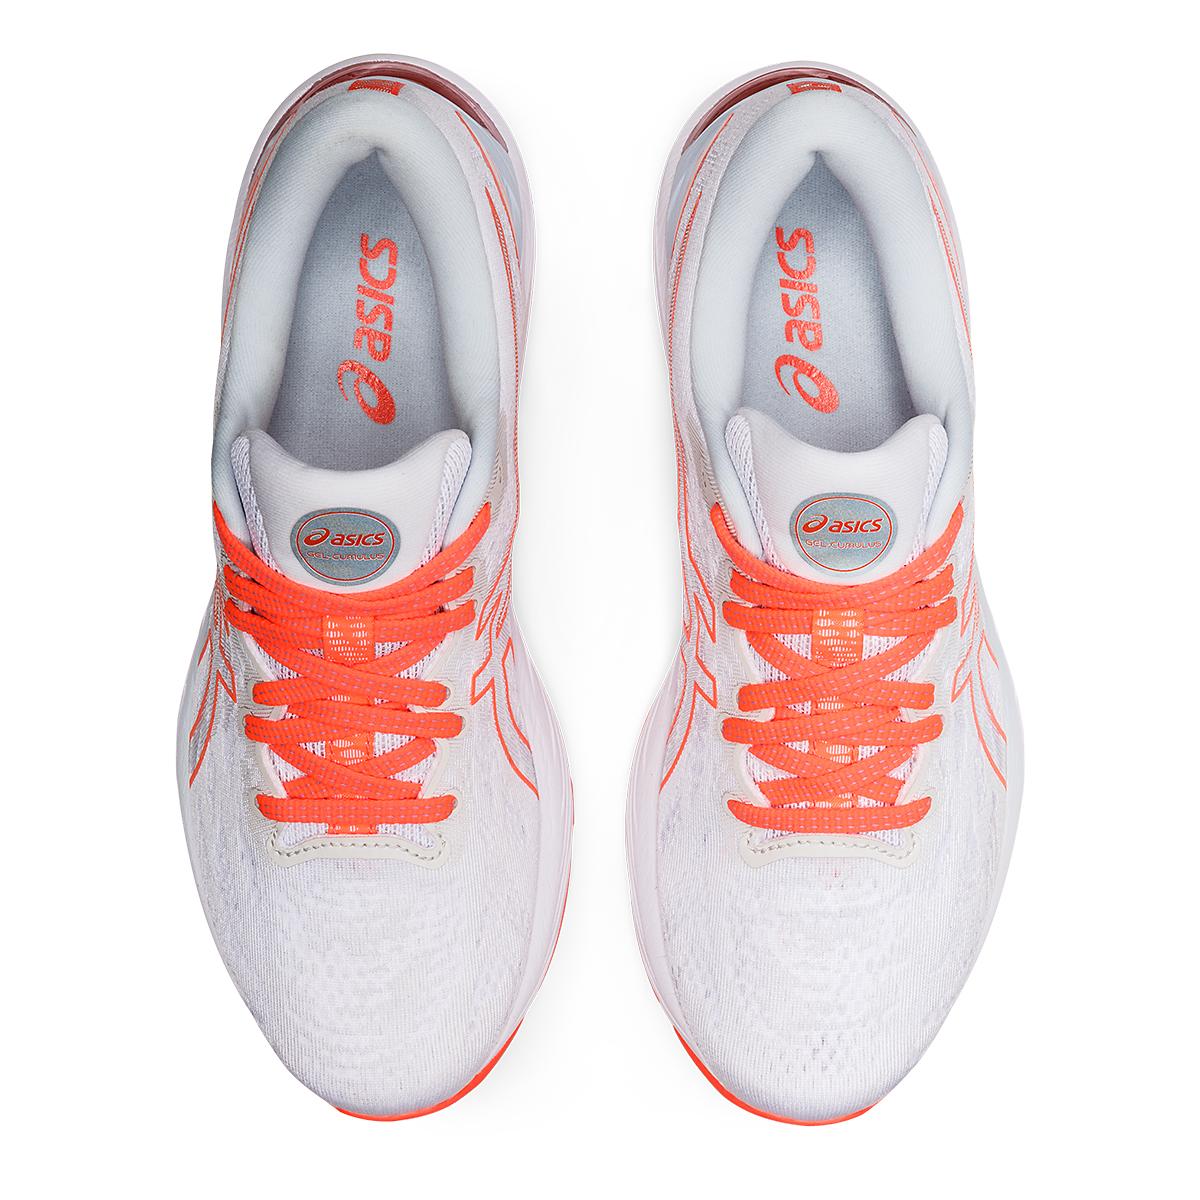 Women's Asics Gel-Cumulus 23 Running Shoe - Color: White/Sky - JackRabbit Exclusive - Size: 5 - Width: Regular, White/Sky - JackRabbit Exclusive, large, image 6